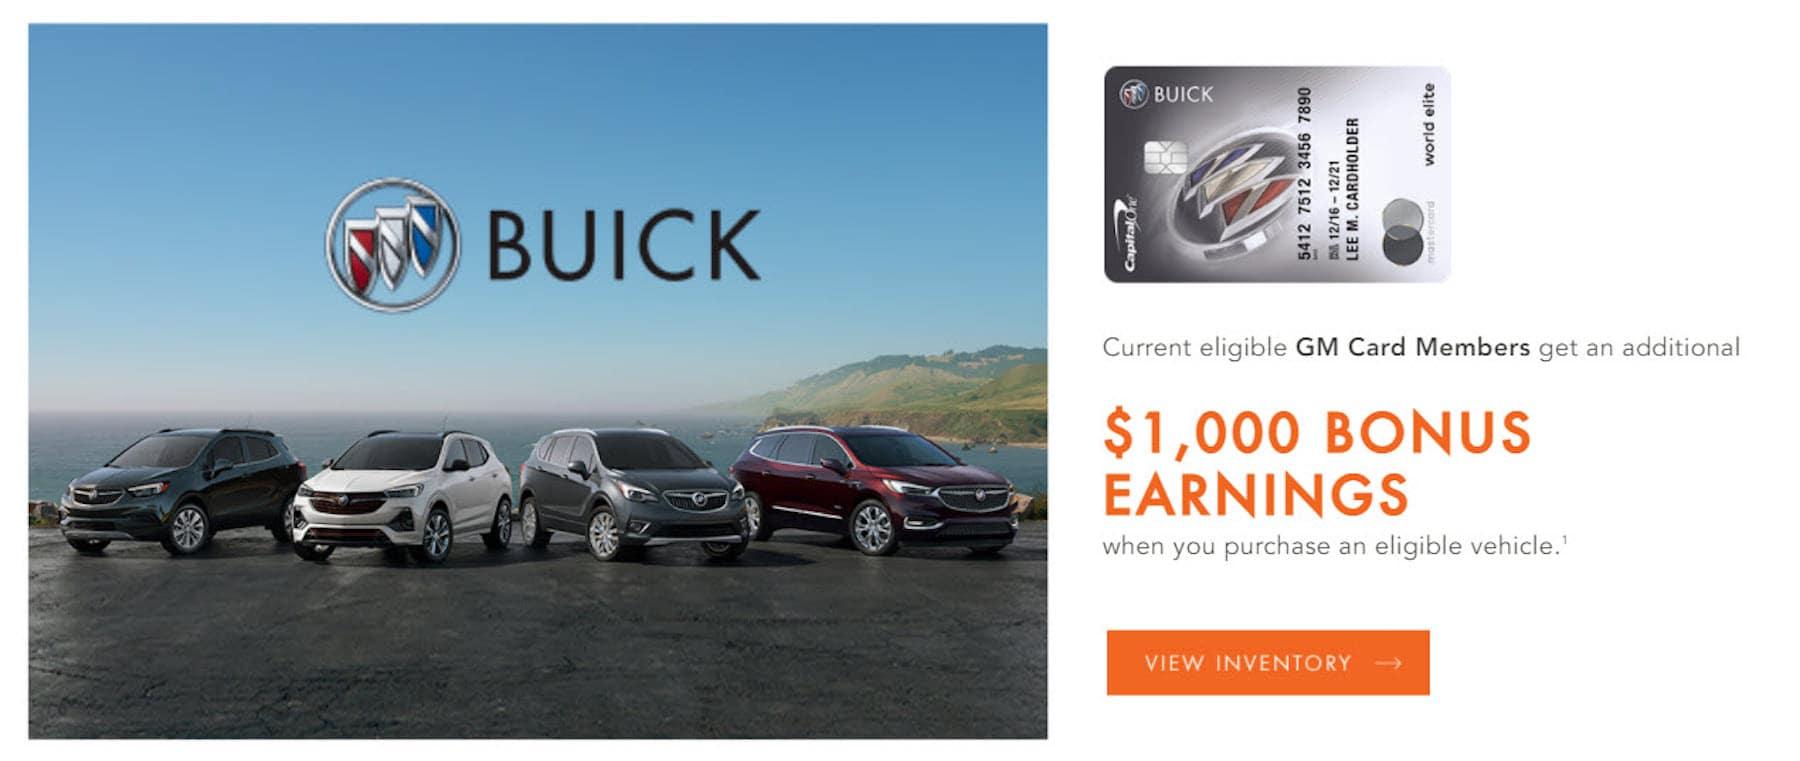 Buick Power Card